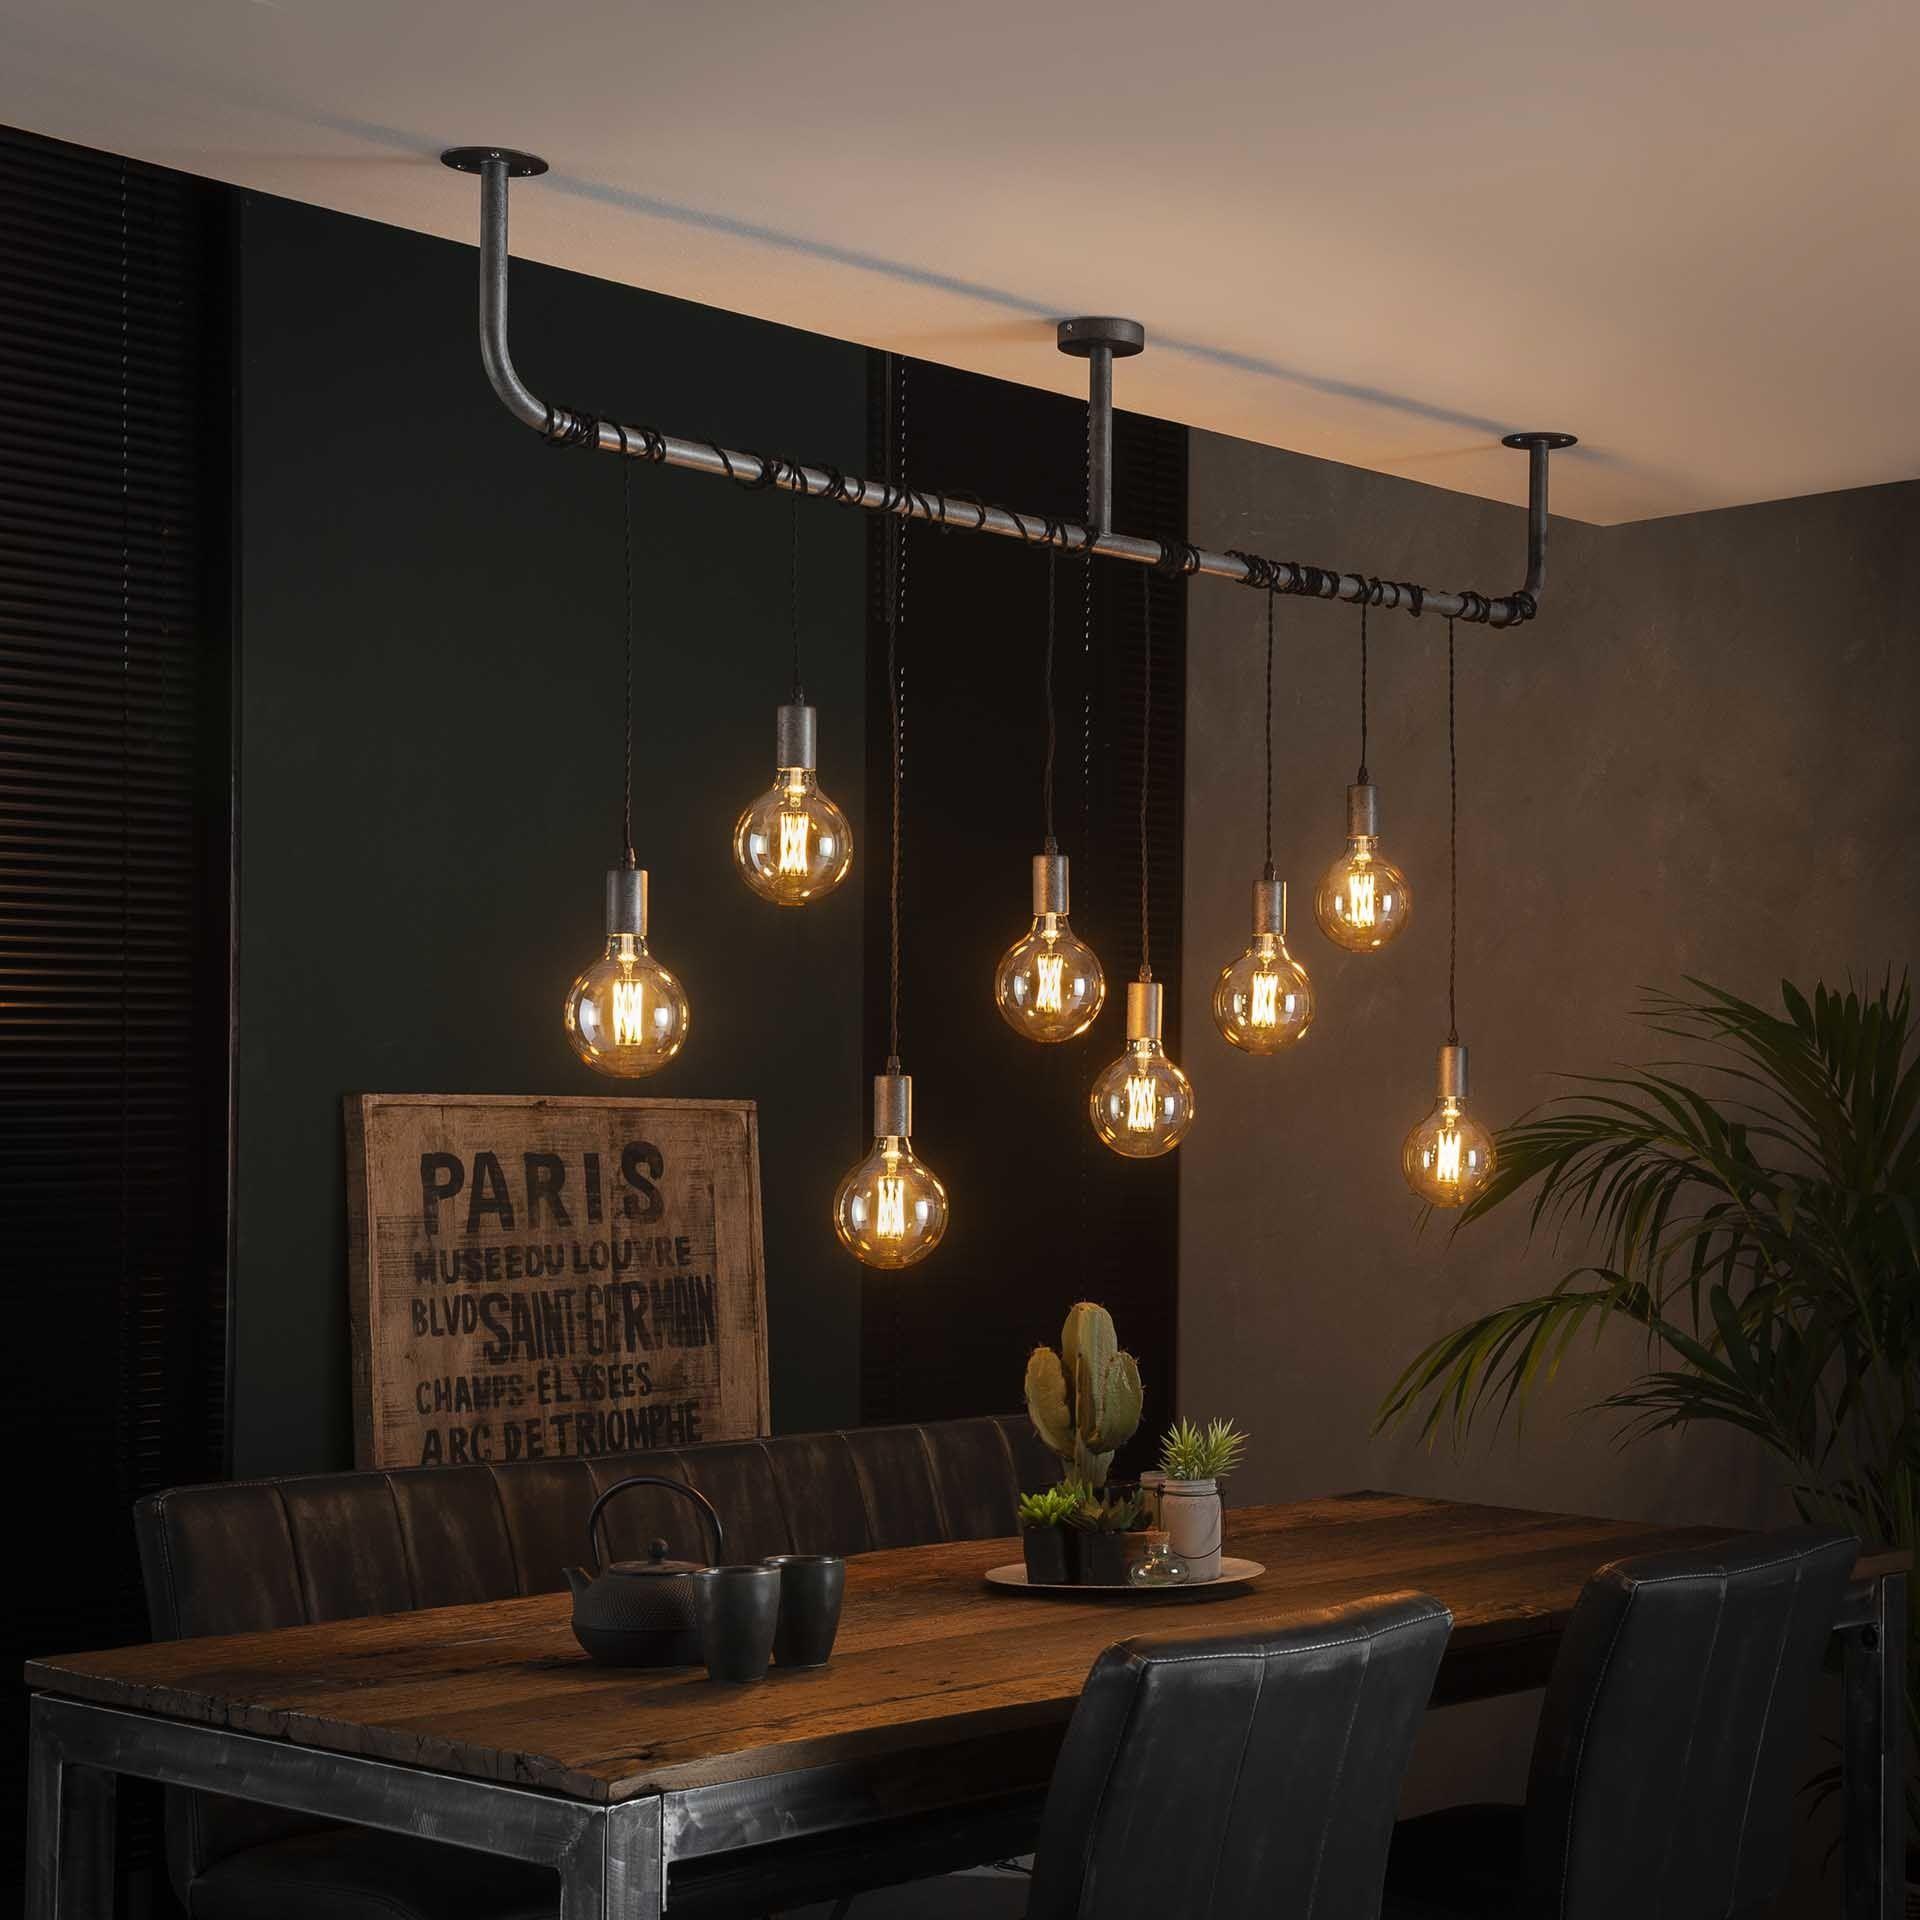 Industriele Hanglamp Glenn 8 Lichts Eetkamer Lamp Design Industriele Hanglampen Tafel Hanglamp